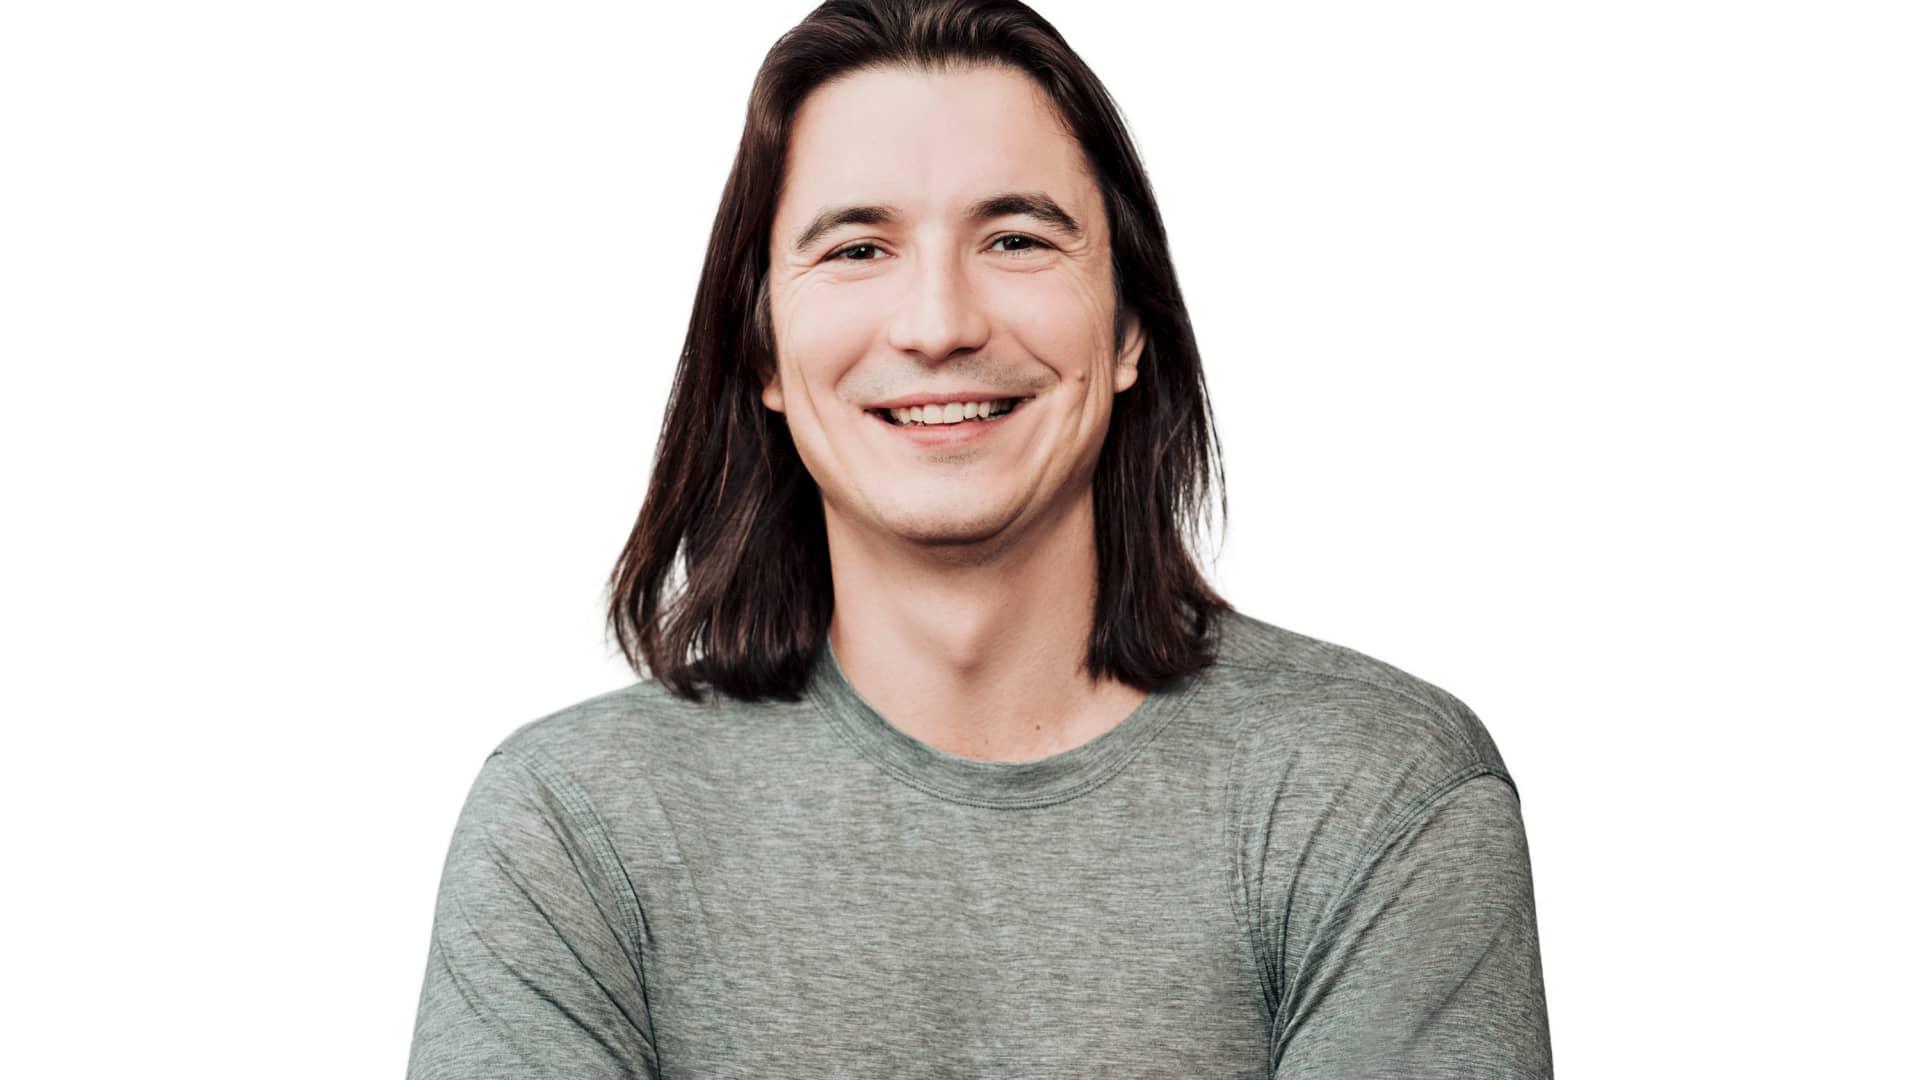 Vlad Tenev, Robinhood